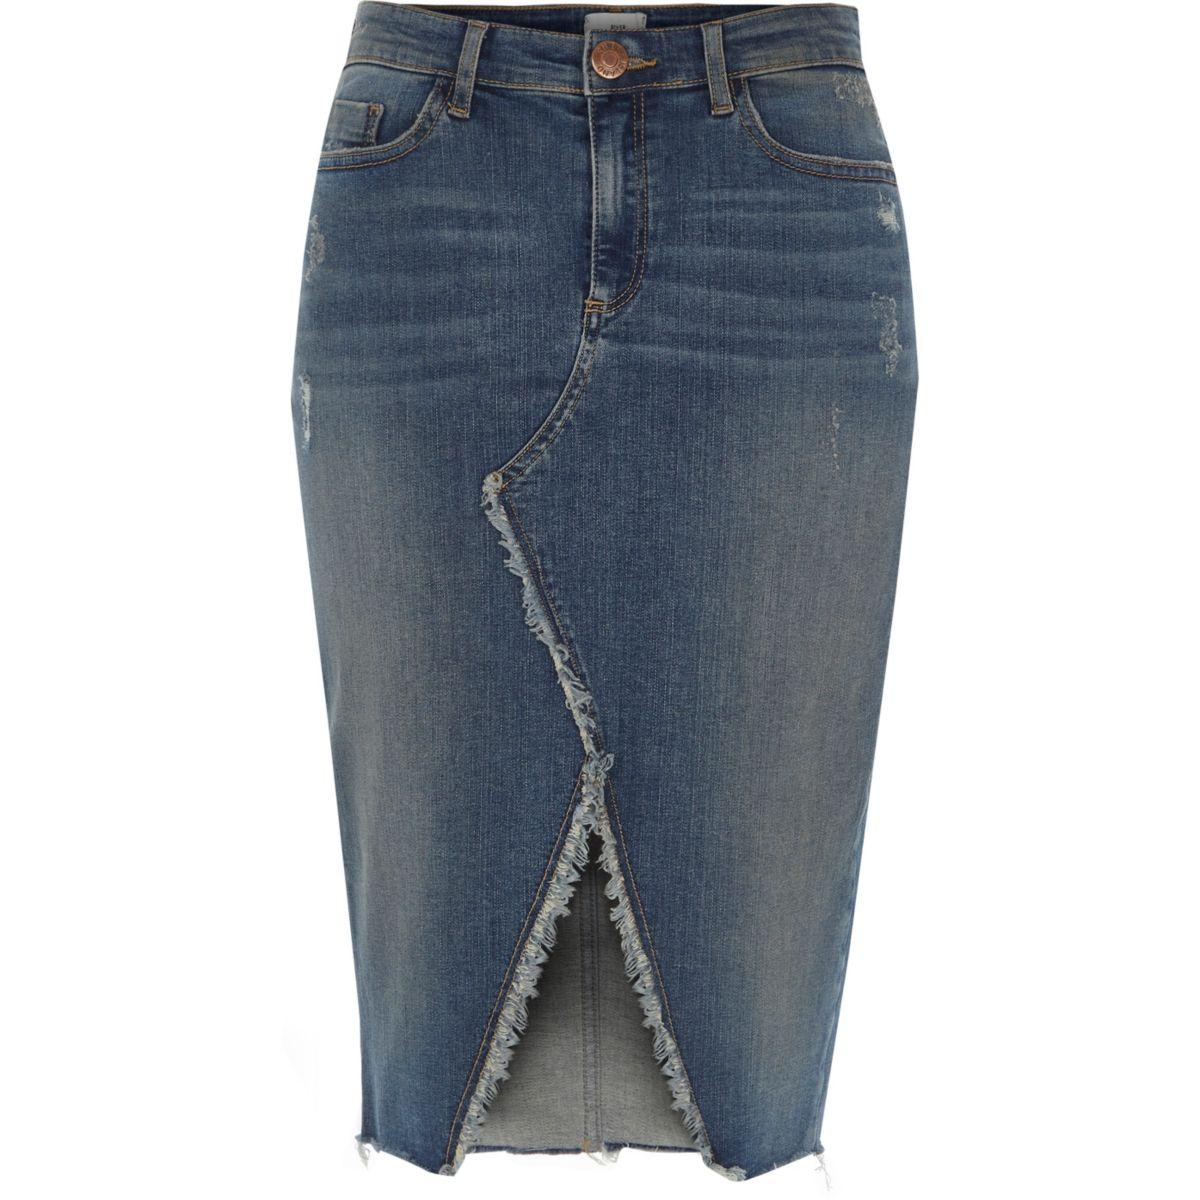 Mid blue frayed split denim pencil skirt